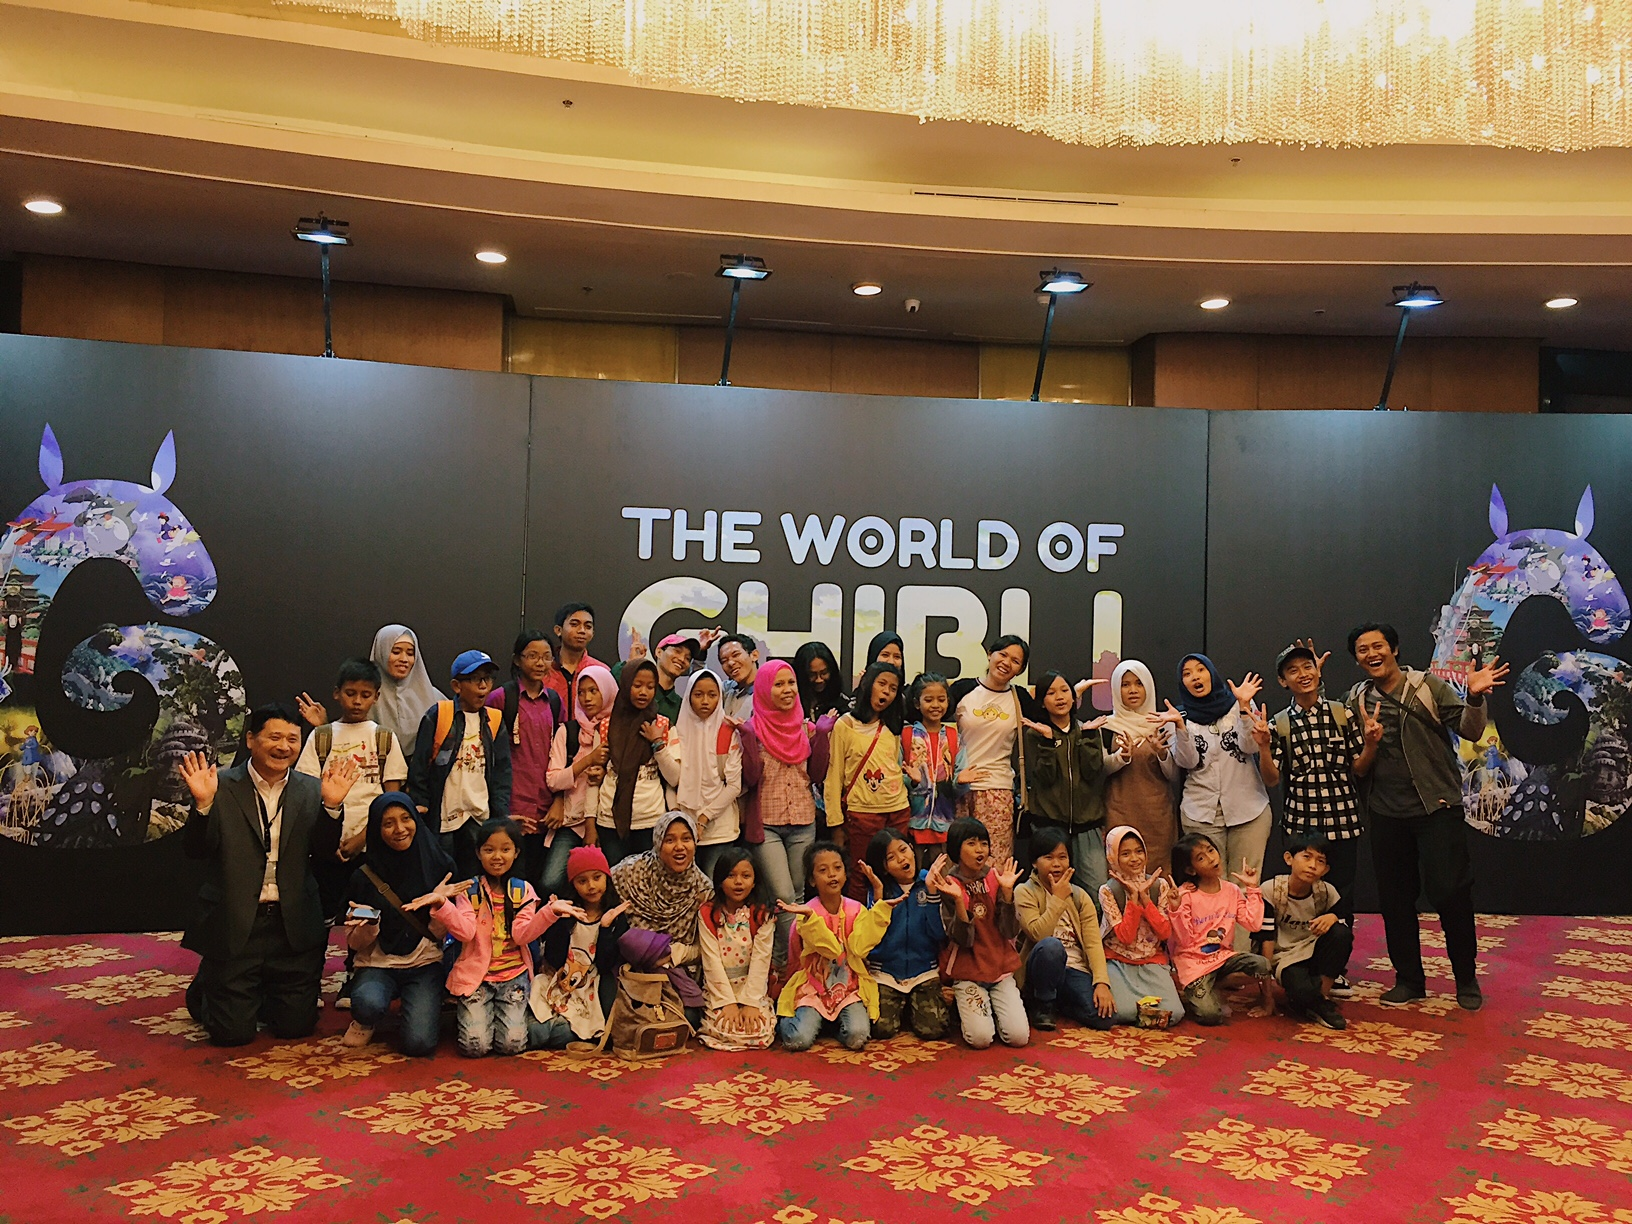 Marubeni's CSR Activity at The World of Ghibli Jakarta Event